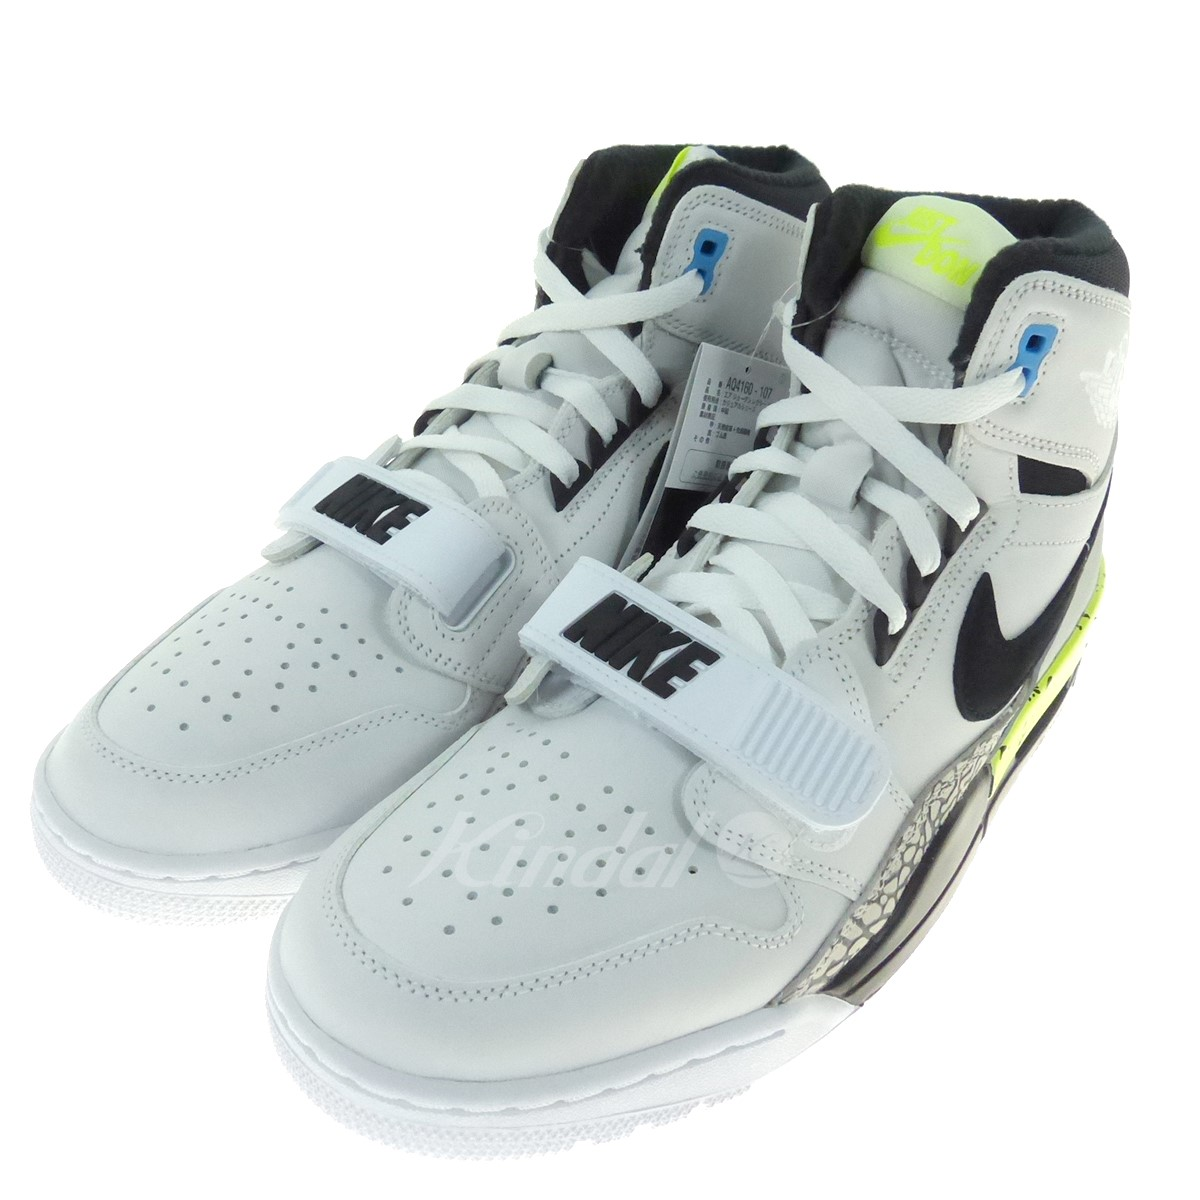 info for e4efa 5eb54 NIKE X DON C AIR JORDAN LEGACY 312 higher frequency elimination sneakers  white X gray X fluorescence green size: 28 5cm (Nike)